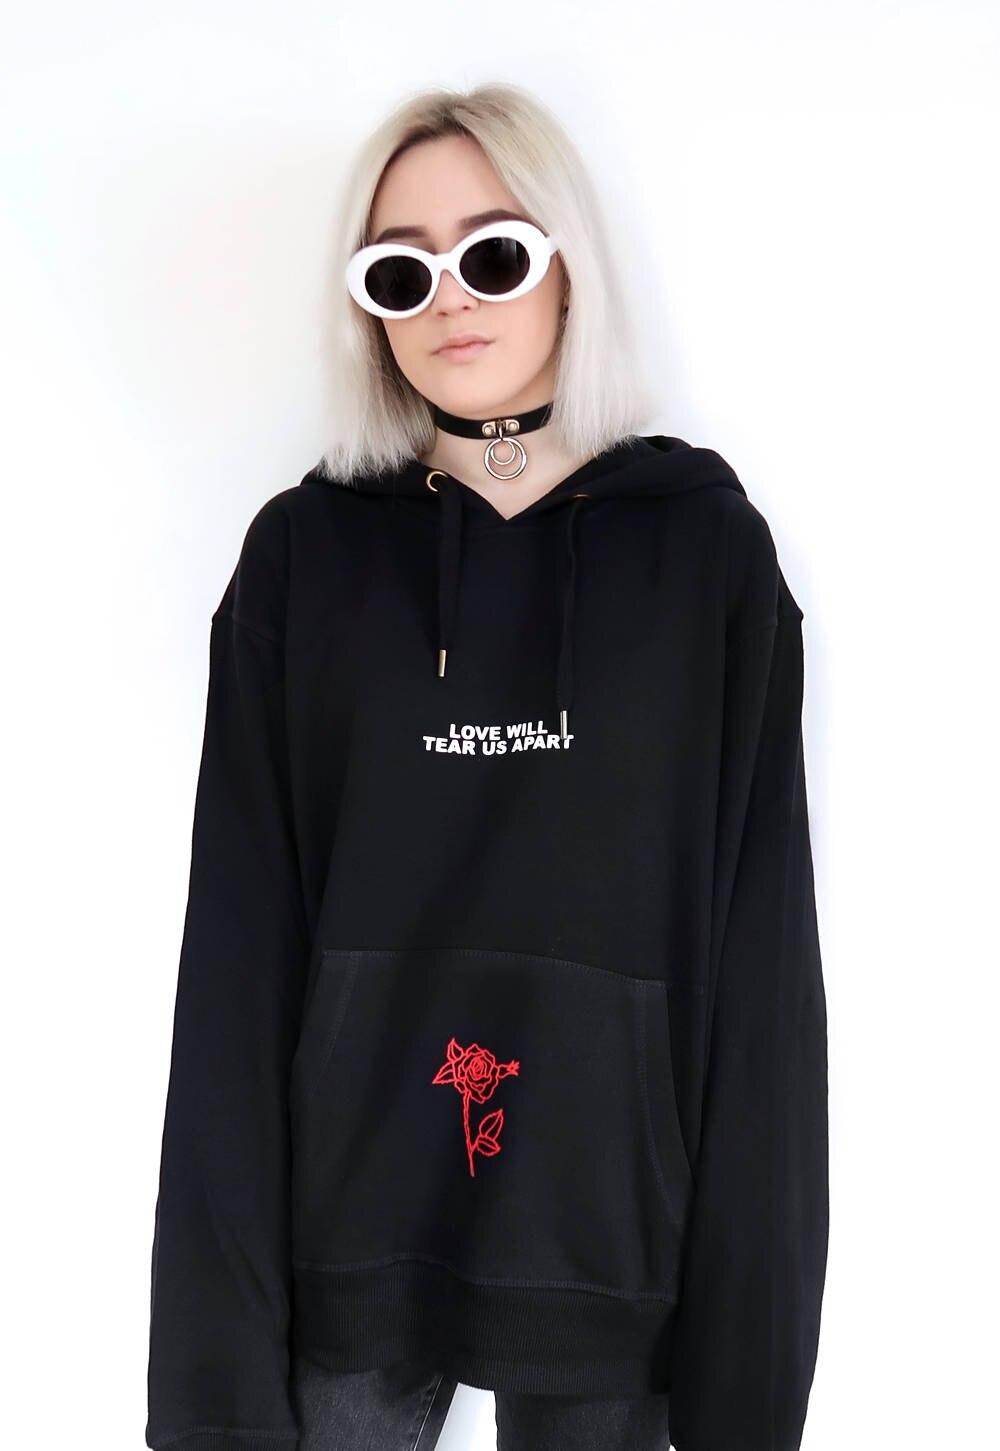 Love Will Tear Us Apart Rose Letter Print Hoodies sudadera negro Tumblr inspirado estética pálido Pastel Grunge estética Tops